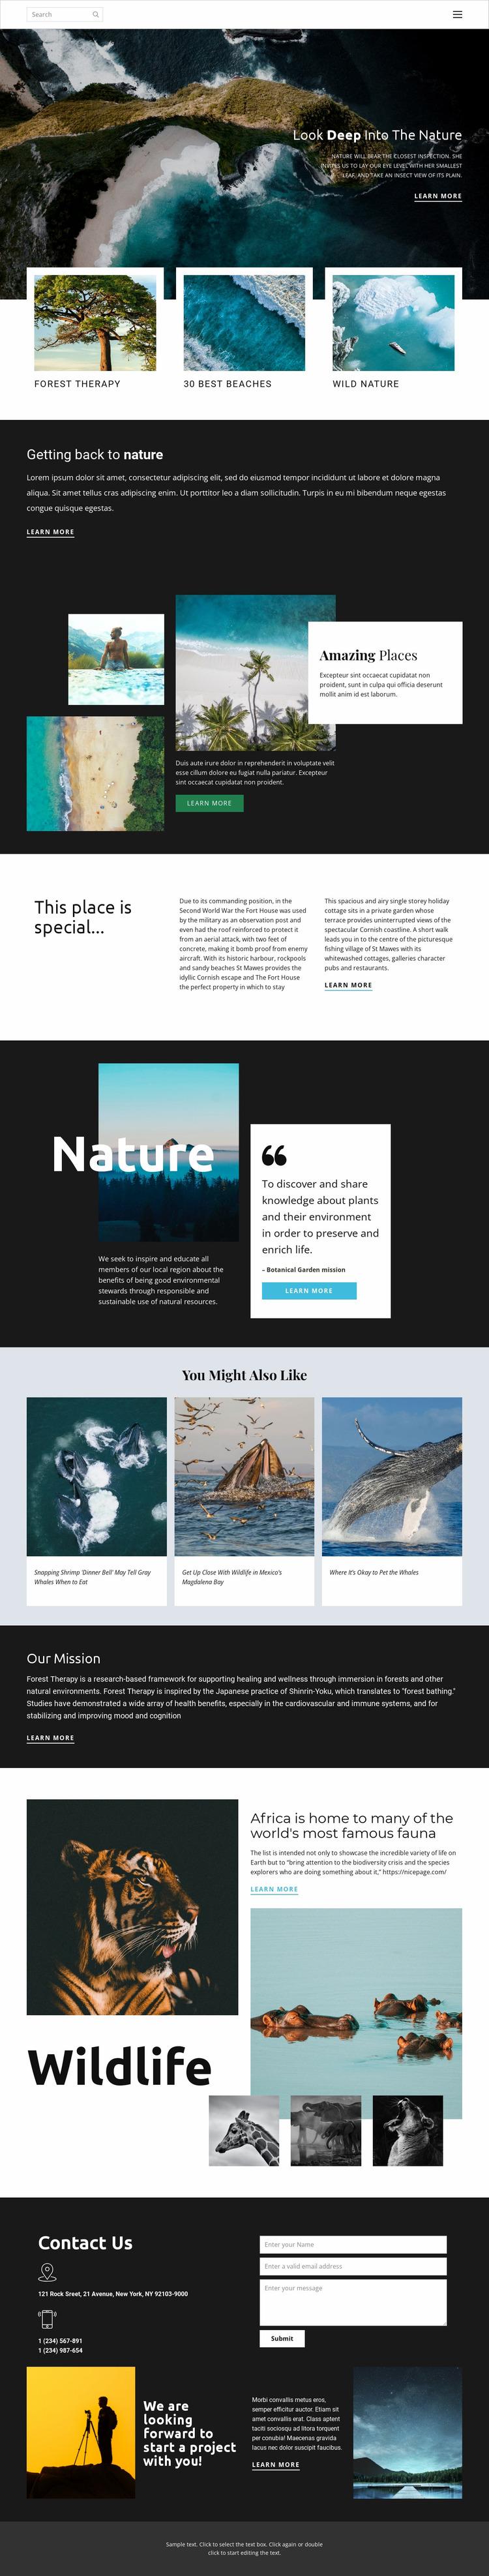 Exploring wildlife and nature Website Mockup